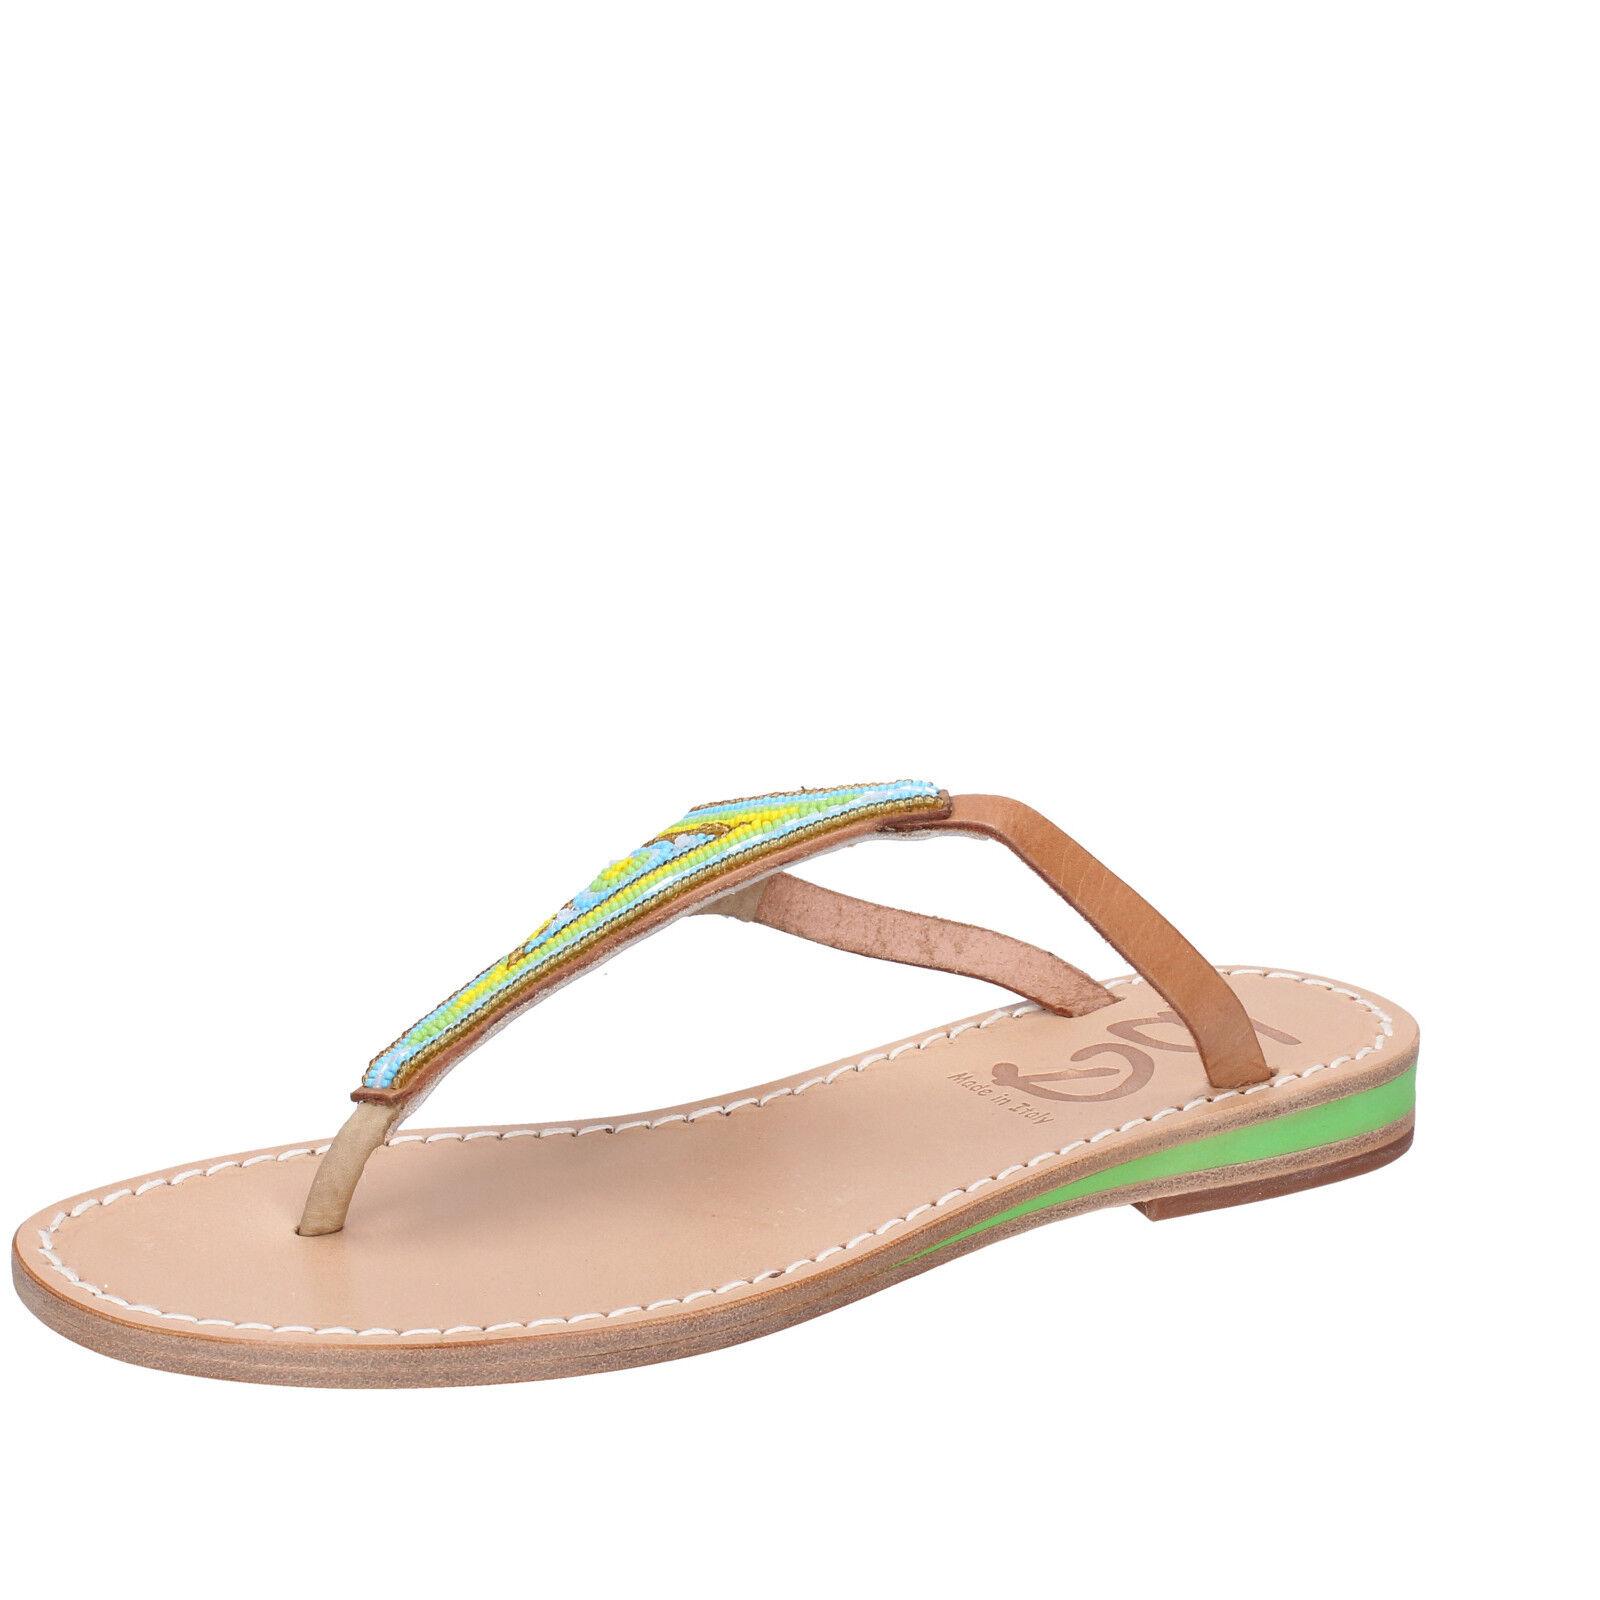 Women's shoes EDDY DANIELE 7 (EU 37) sandals multicolor leather AW384-37